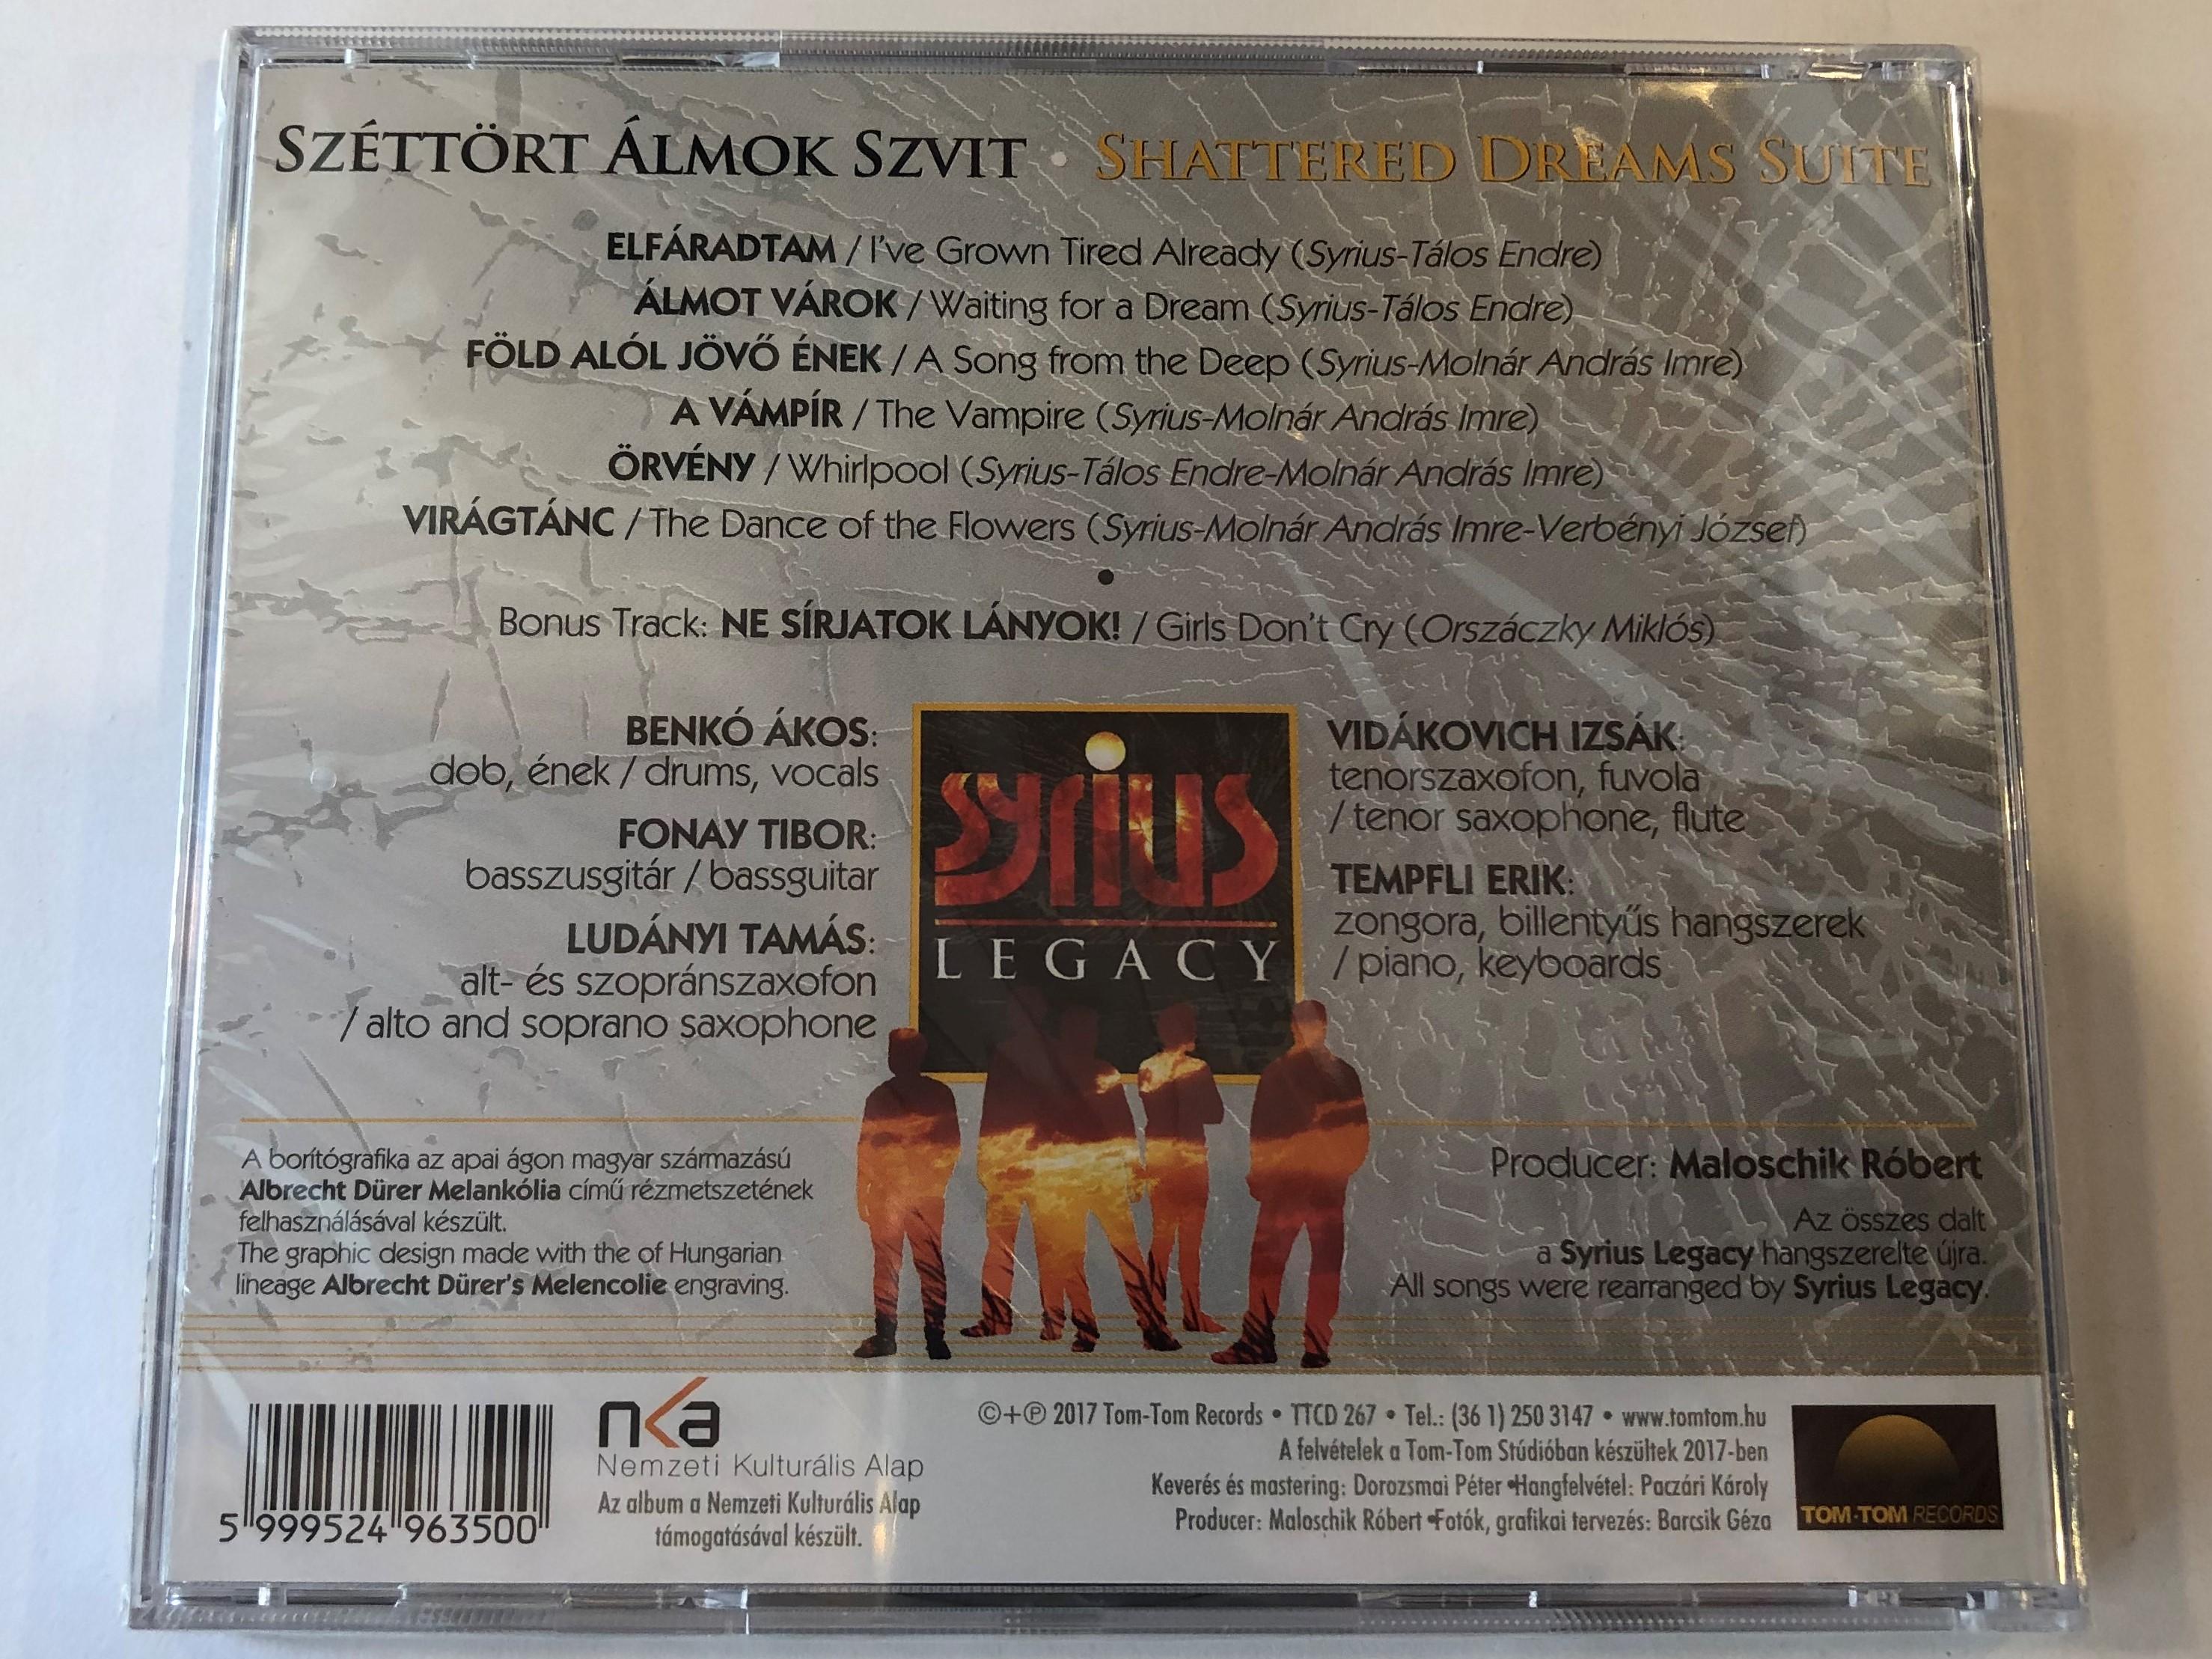 syrius-legacy-sz-tt-rt-lmok-szv-t-shattered-dreams-suite-tom-tom-studio-audio-cd-2017-ttcd267-2-.jpg